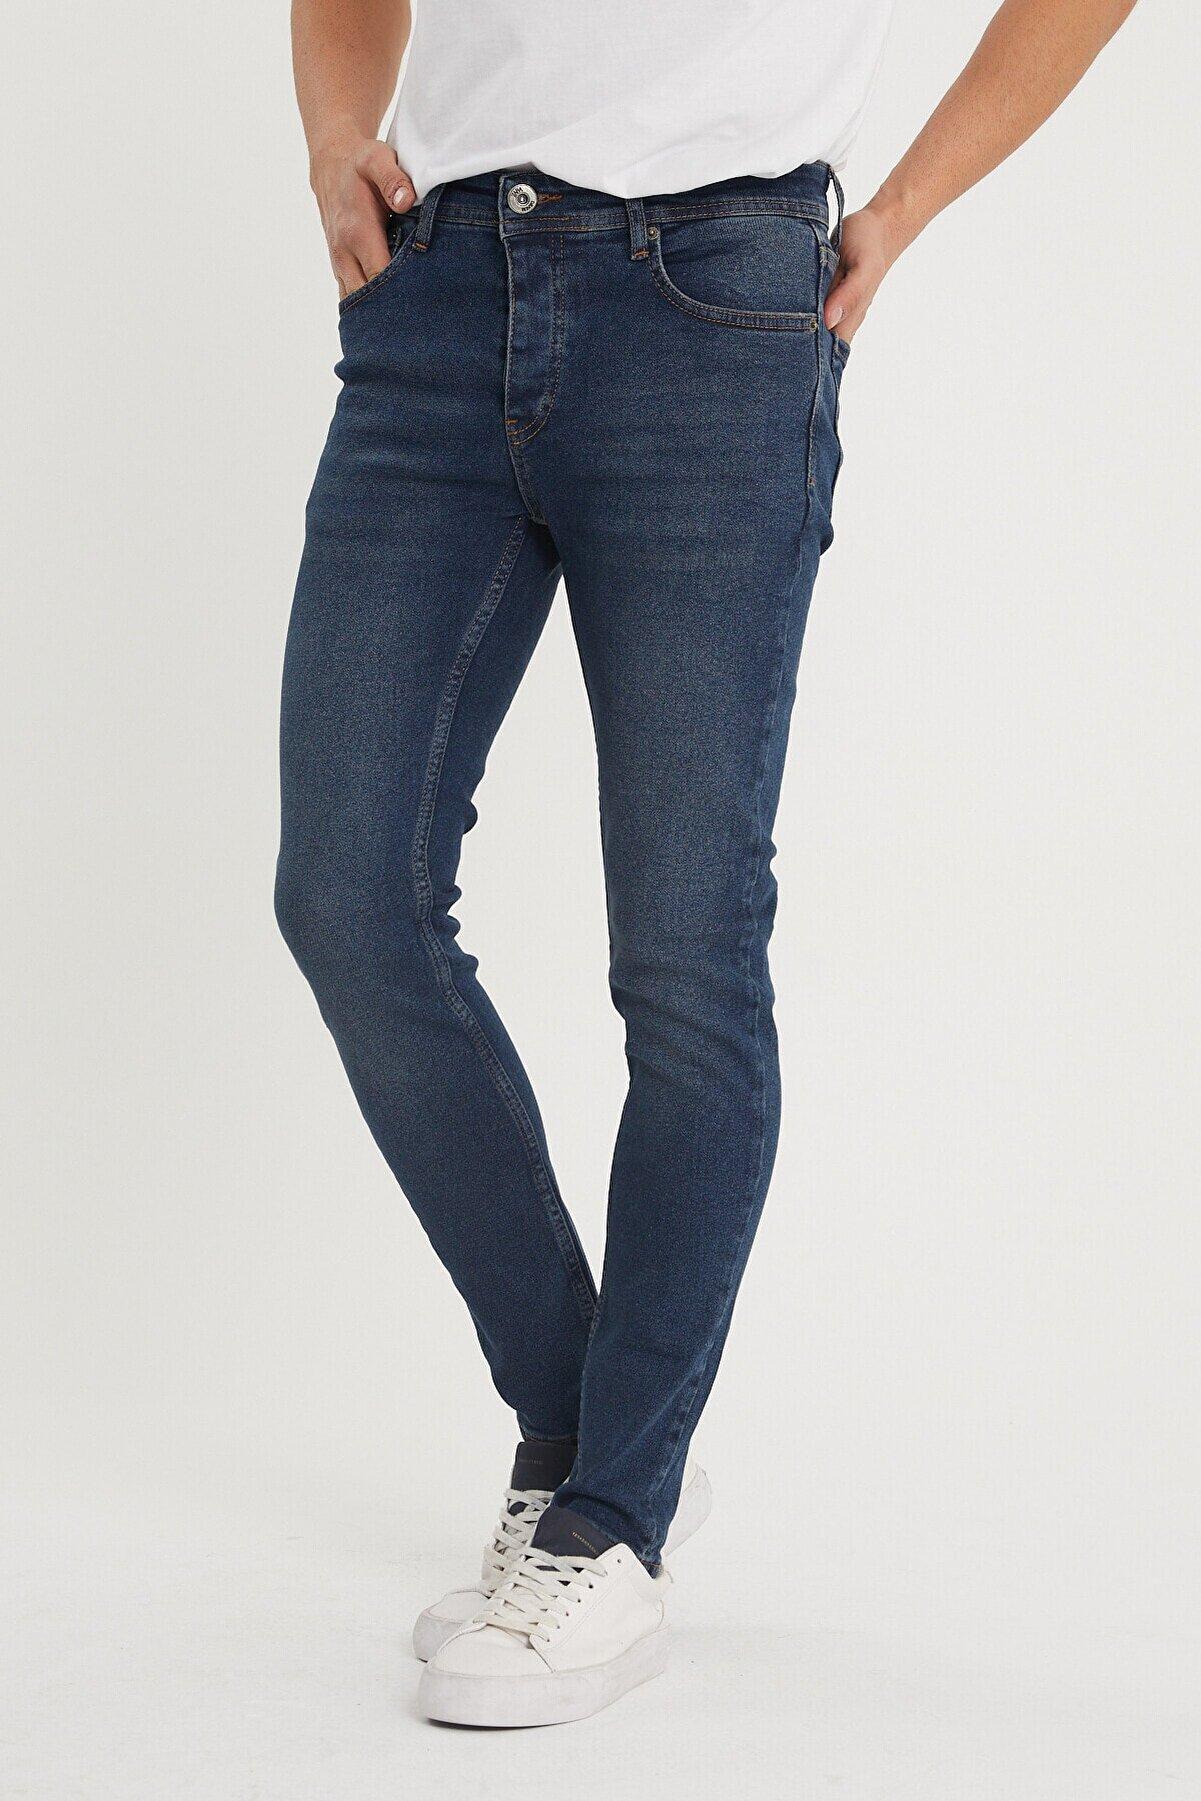 XHAN Erkek Lacivert Yıkamalı Slim Fit Jean Pantolon 1kxe5-44351-48